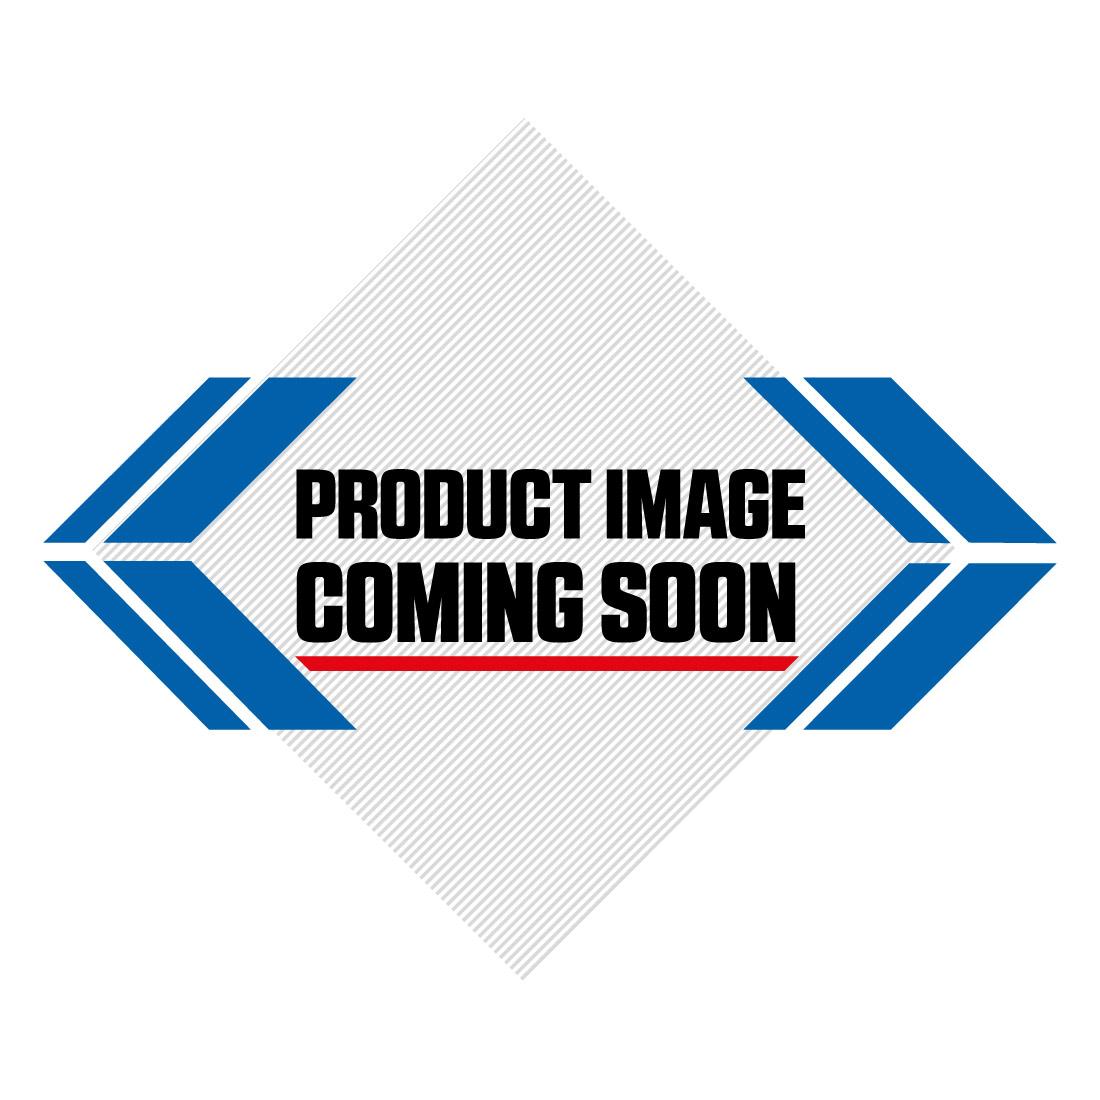 Suzuki Plastic Kit RMZ 450 (08-17) OEM Factory Image-2>